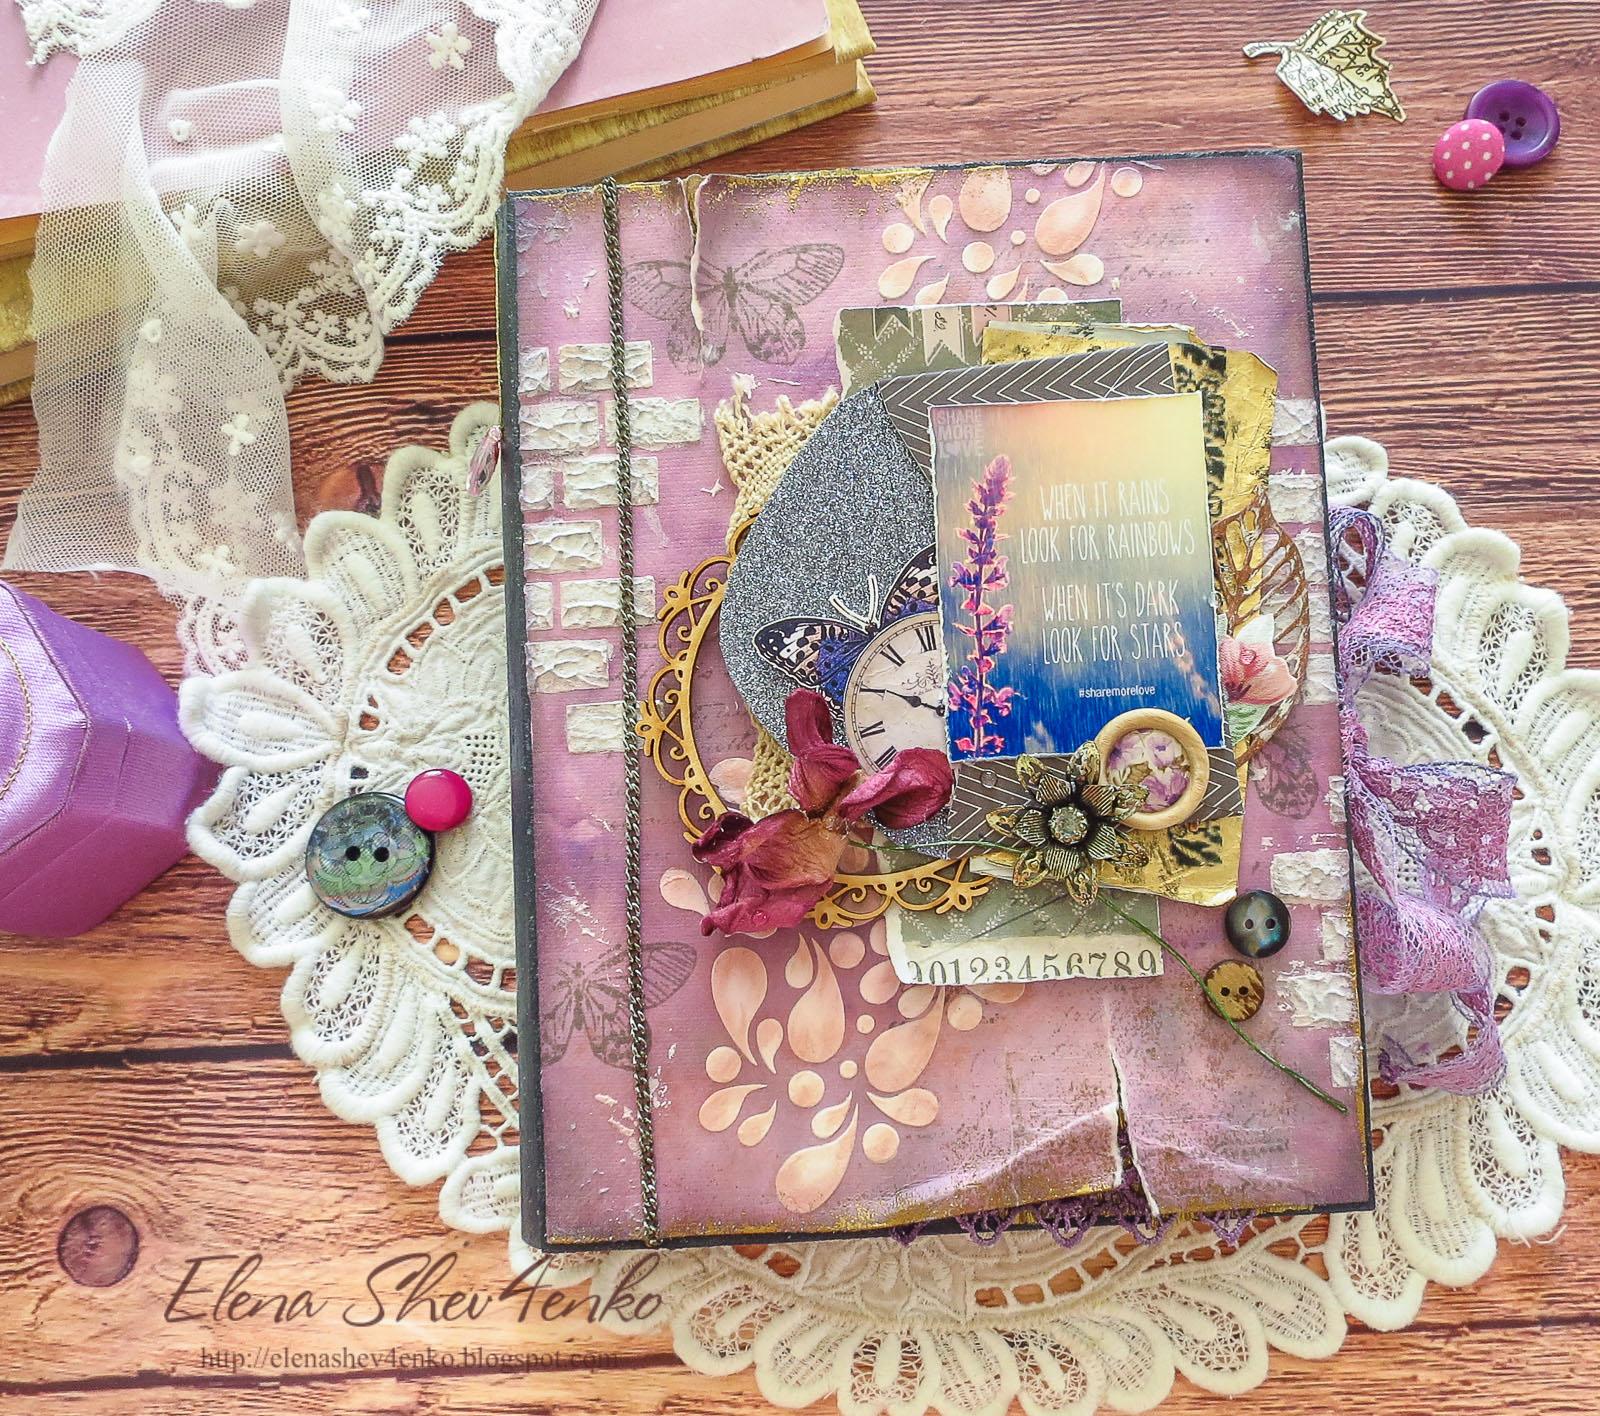 коробочка-книга, скрапбукинг, коробочка для подарка, подарок девушке, лаванда, lavender, box for gift, scrapbooking, box